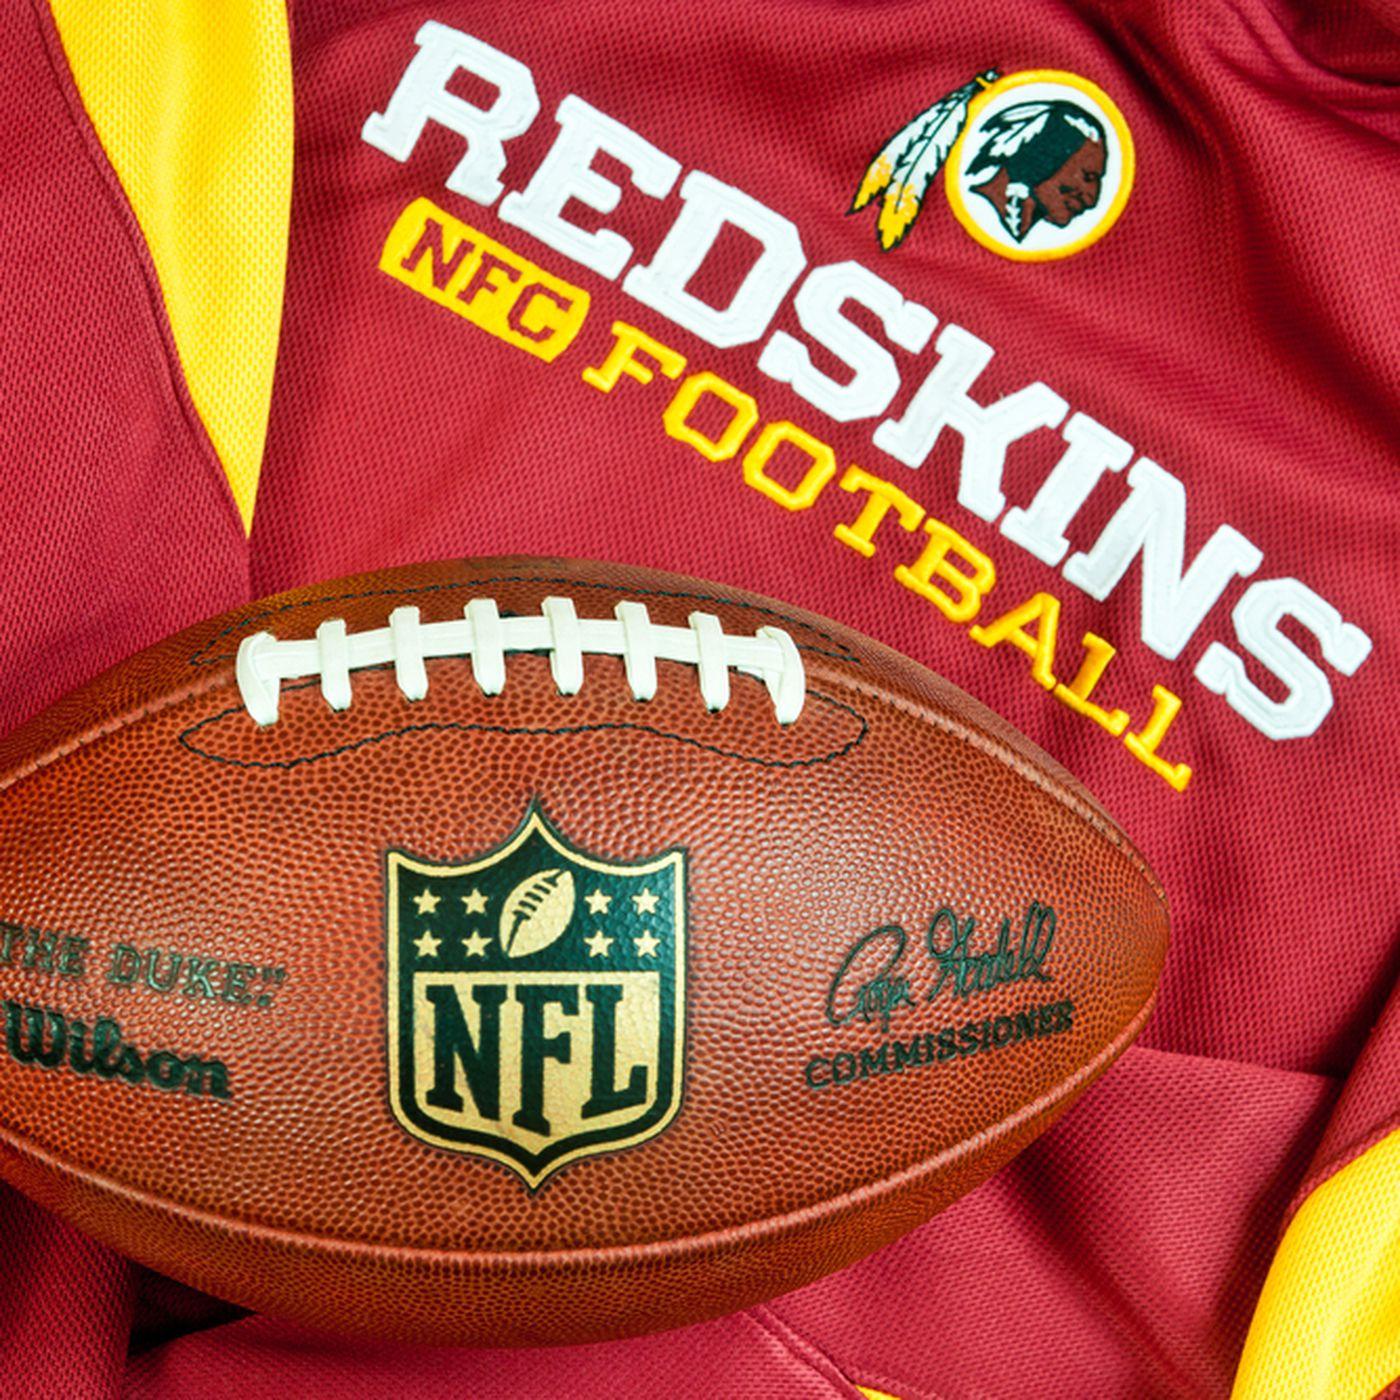 US patent office cancels Washington Redskins trademarks